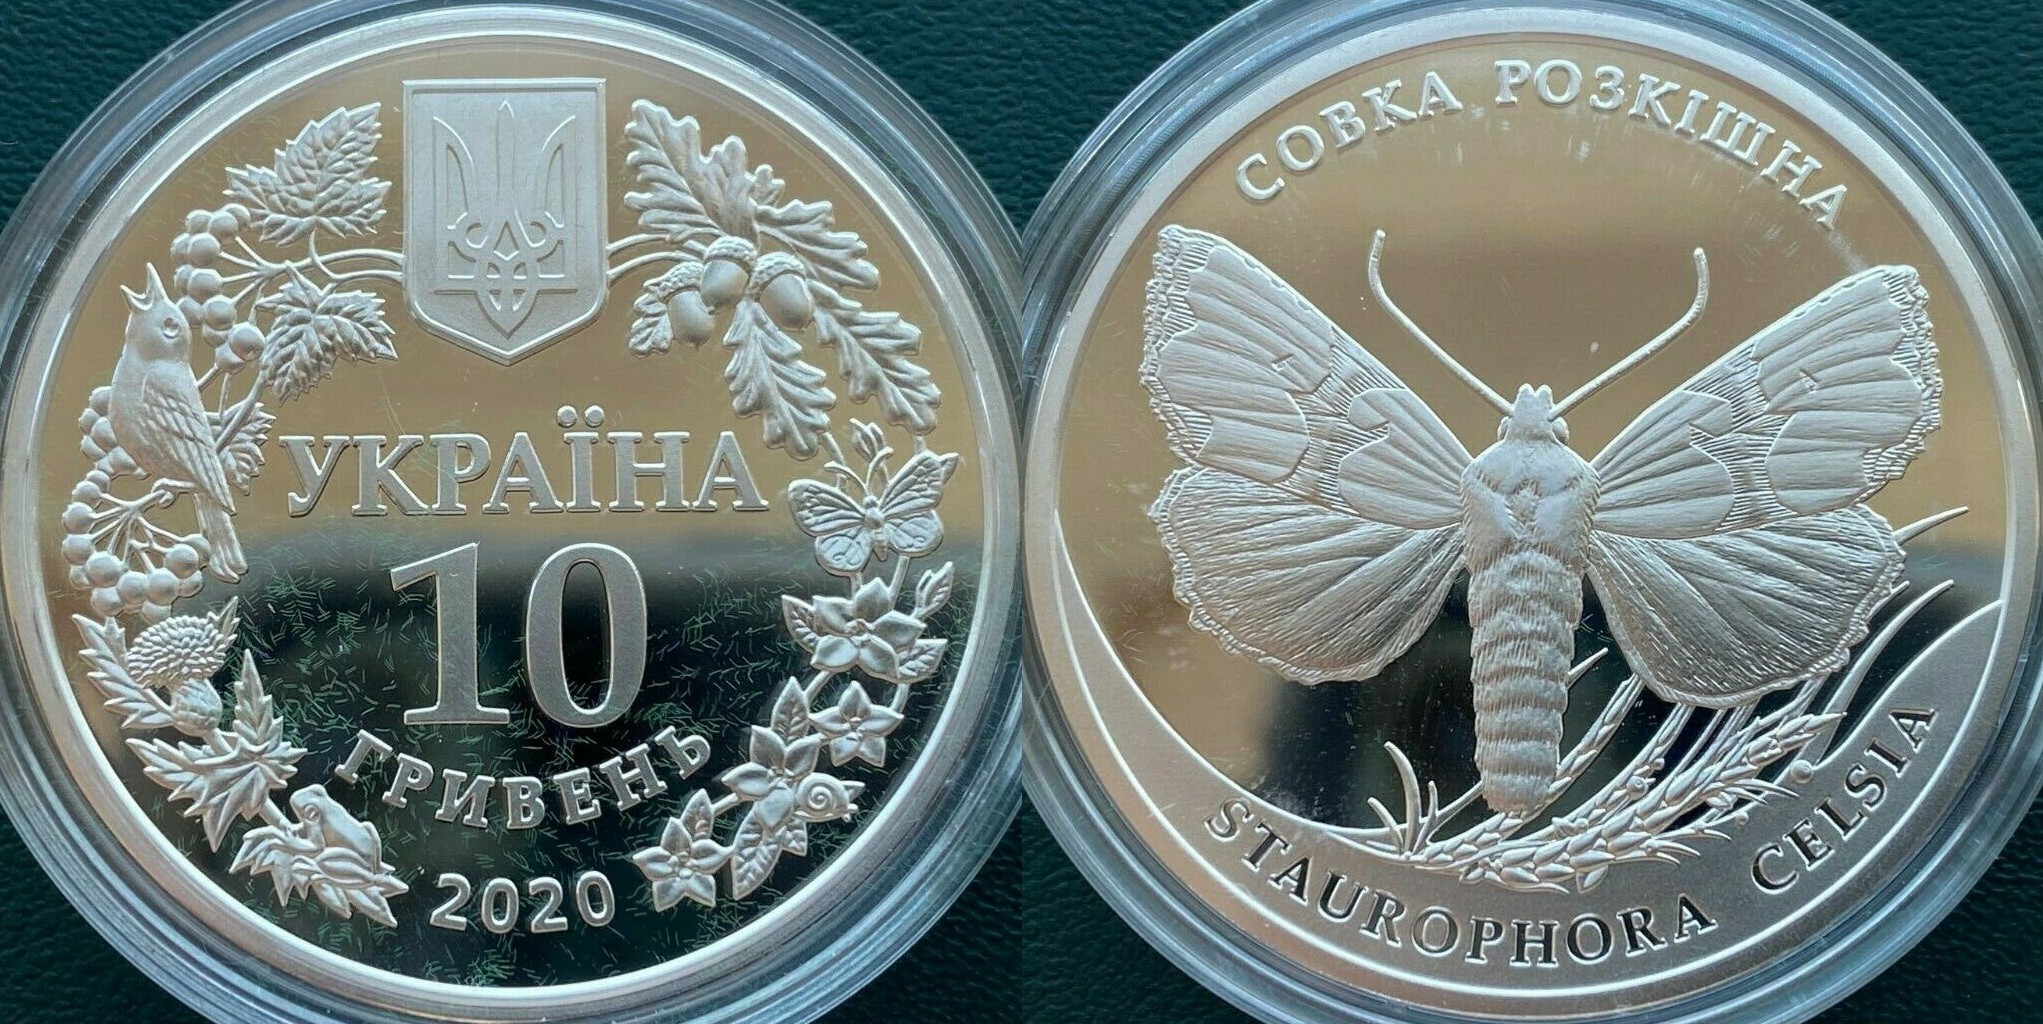 ukraine-2020-papillon-staurophora-celsia